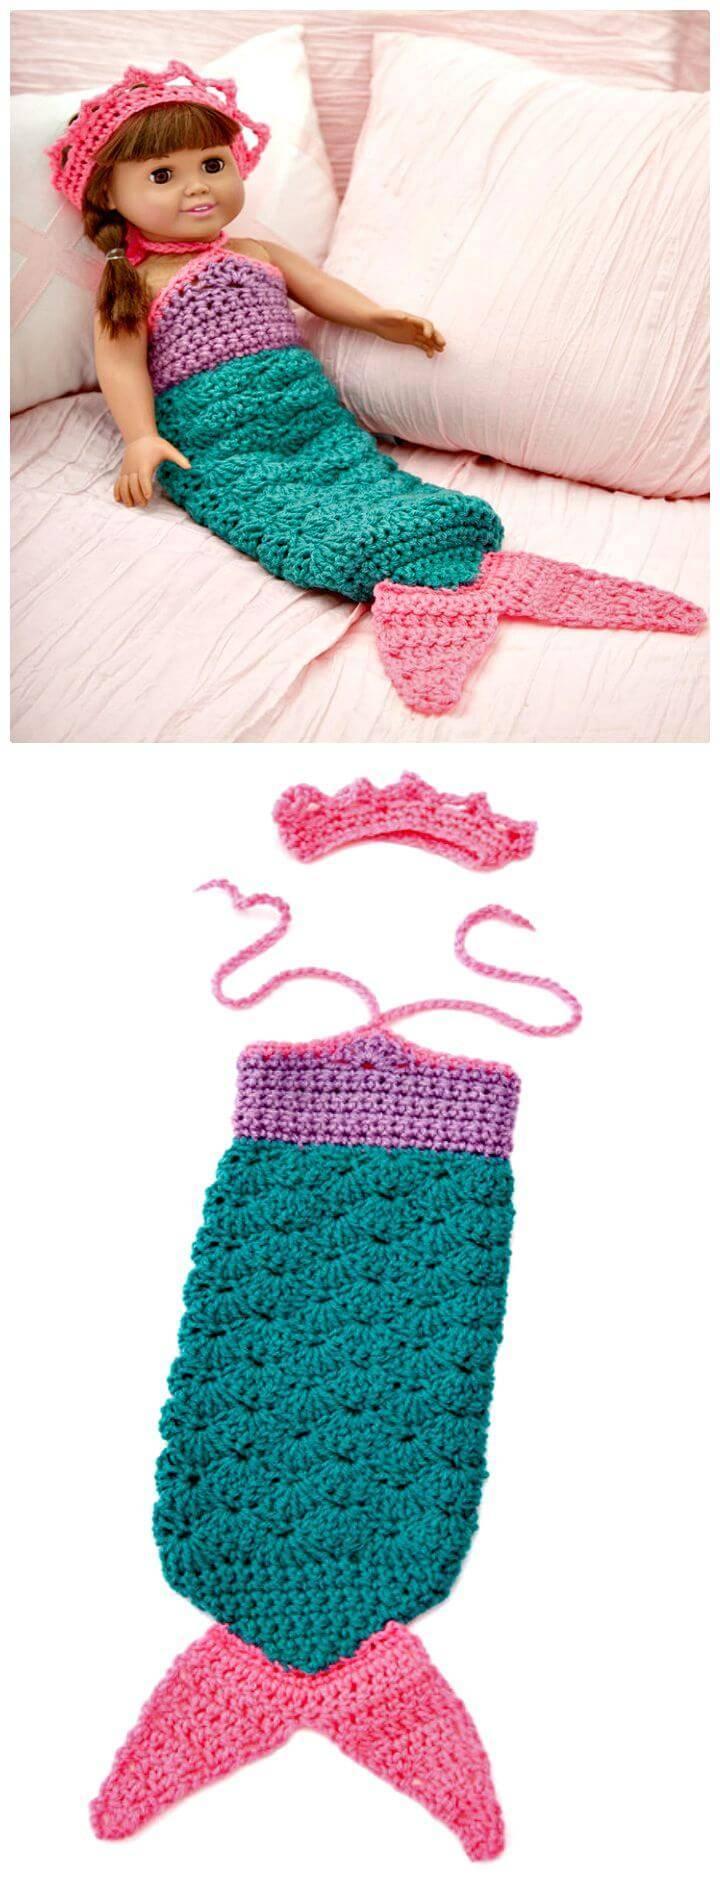 Free Crochet Pattern For Baby Mermaid Cocoon Custom Inspiration Ideas